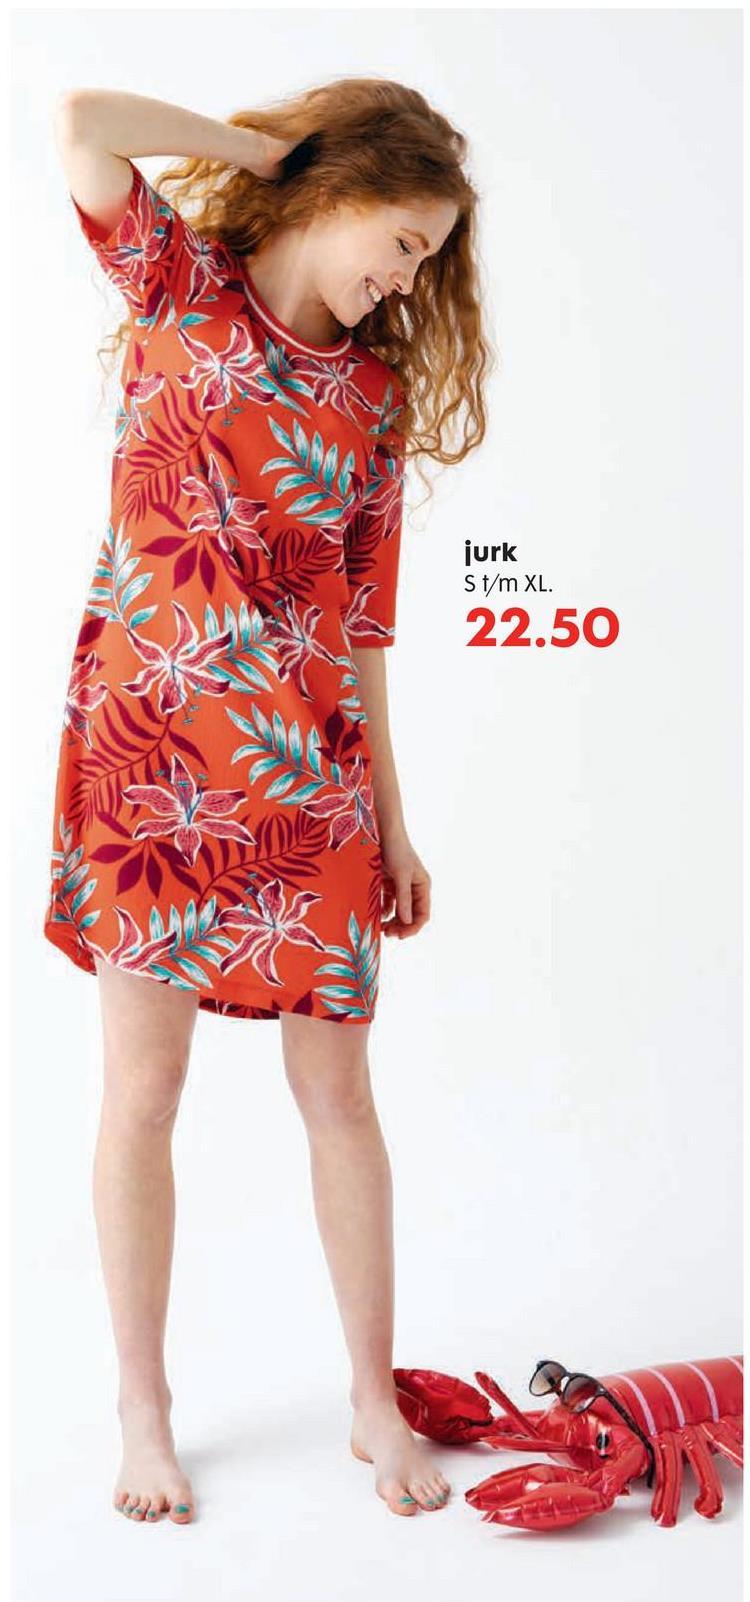 jurk St/m XL. 22.50